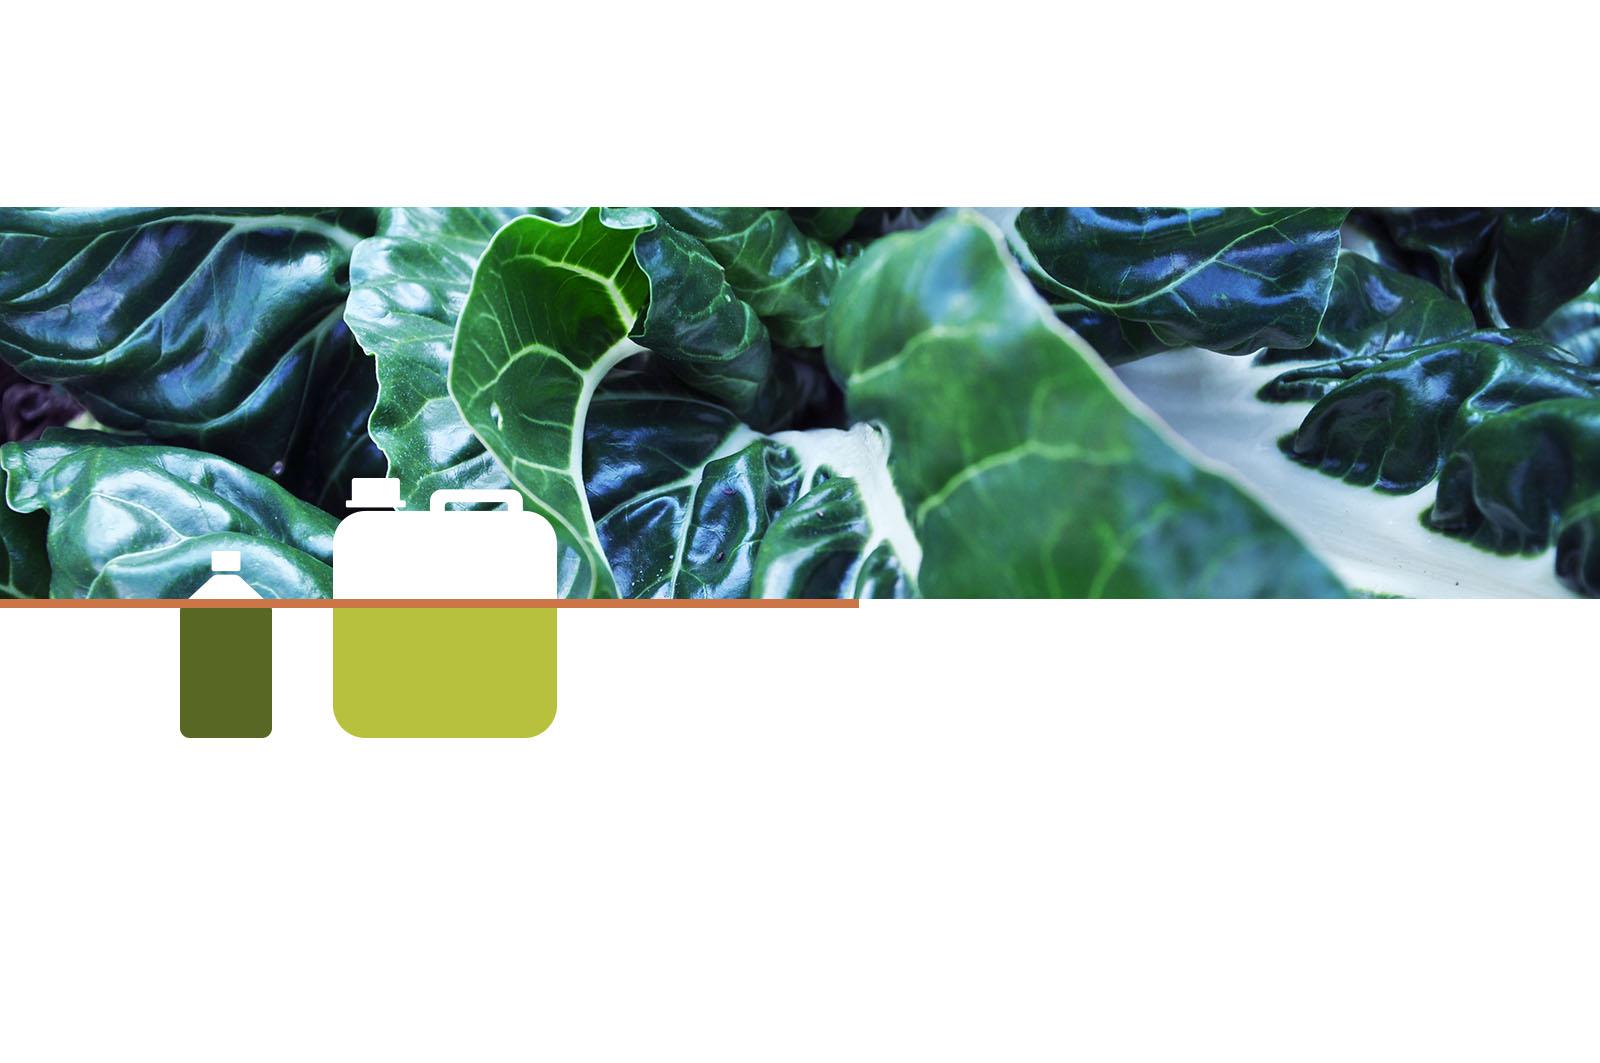 Titelbild_Garten_Landwirtschaft_Bioduenger_Eussenheimer_Manufaktur